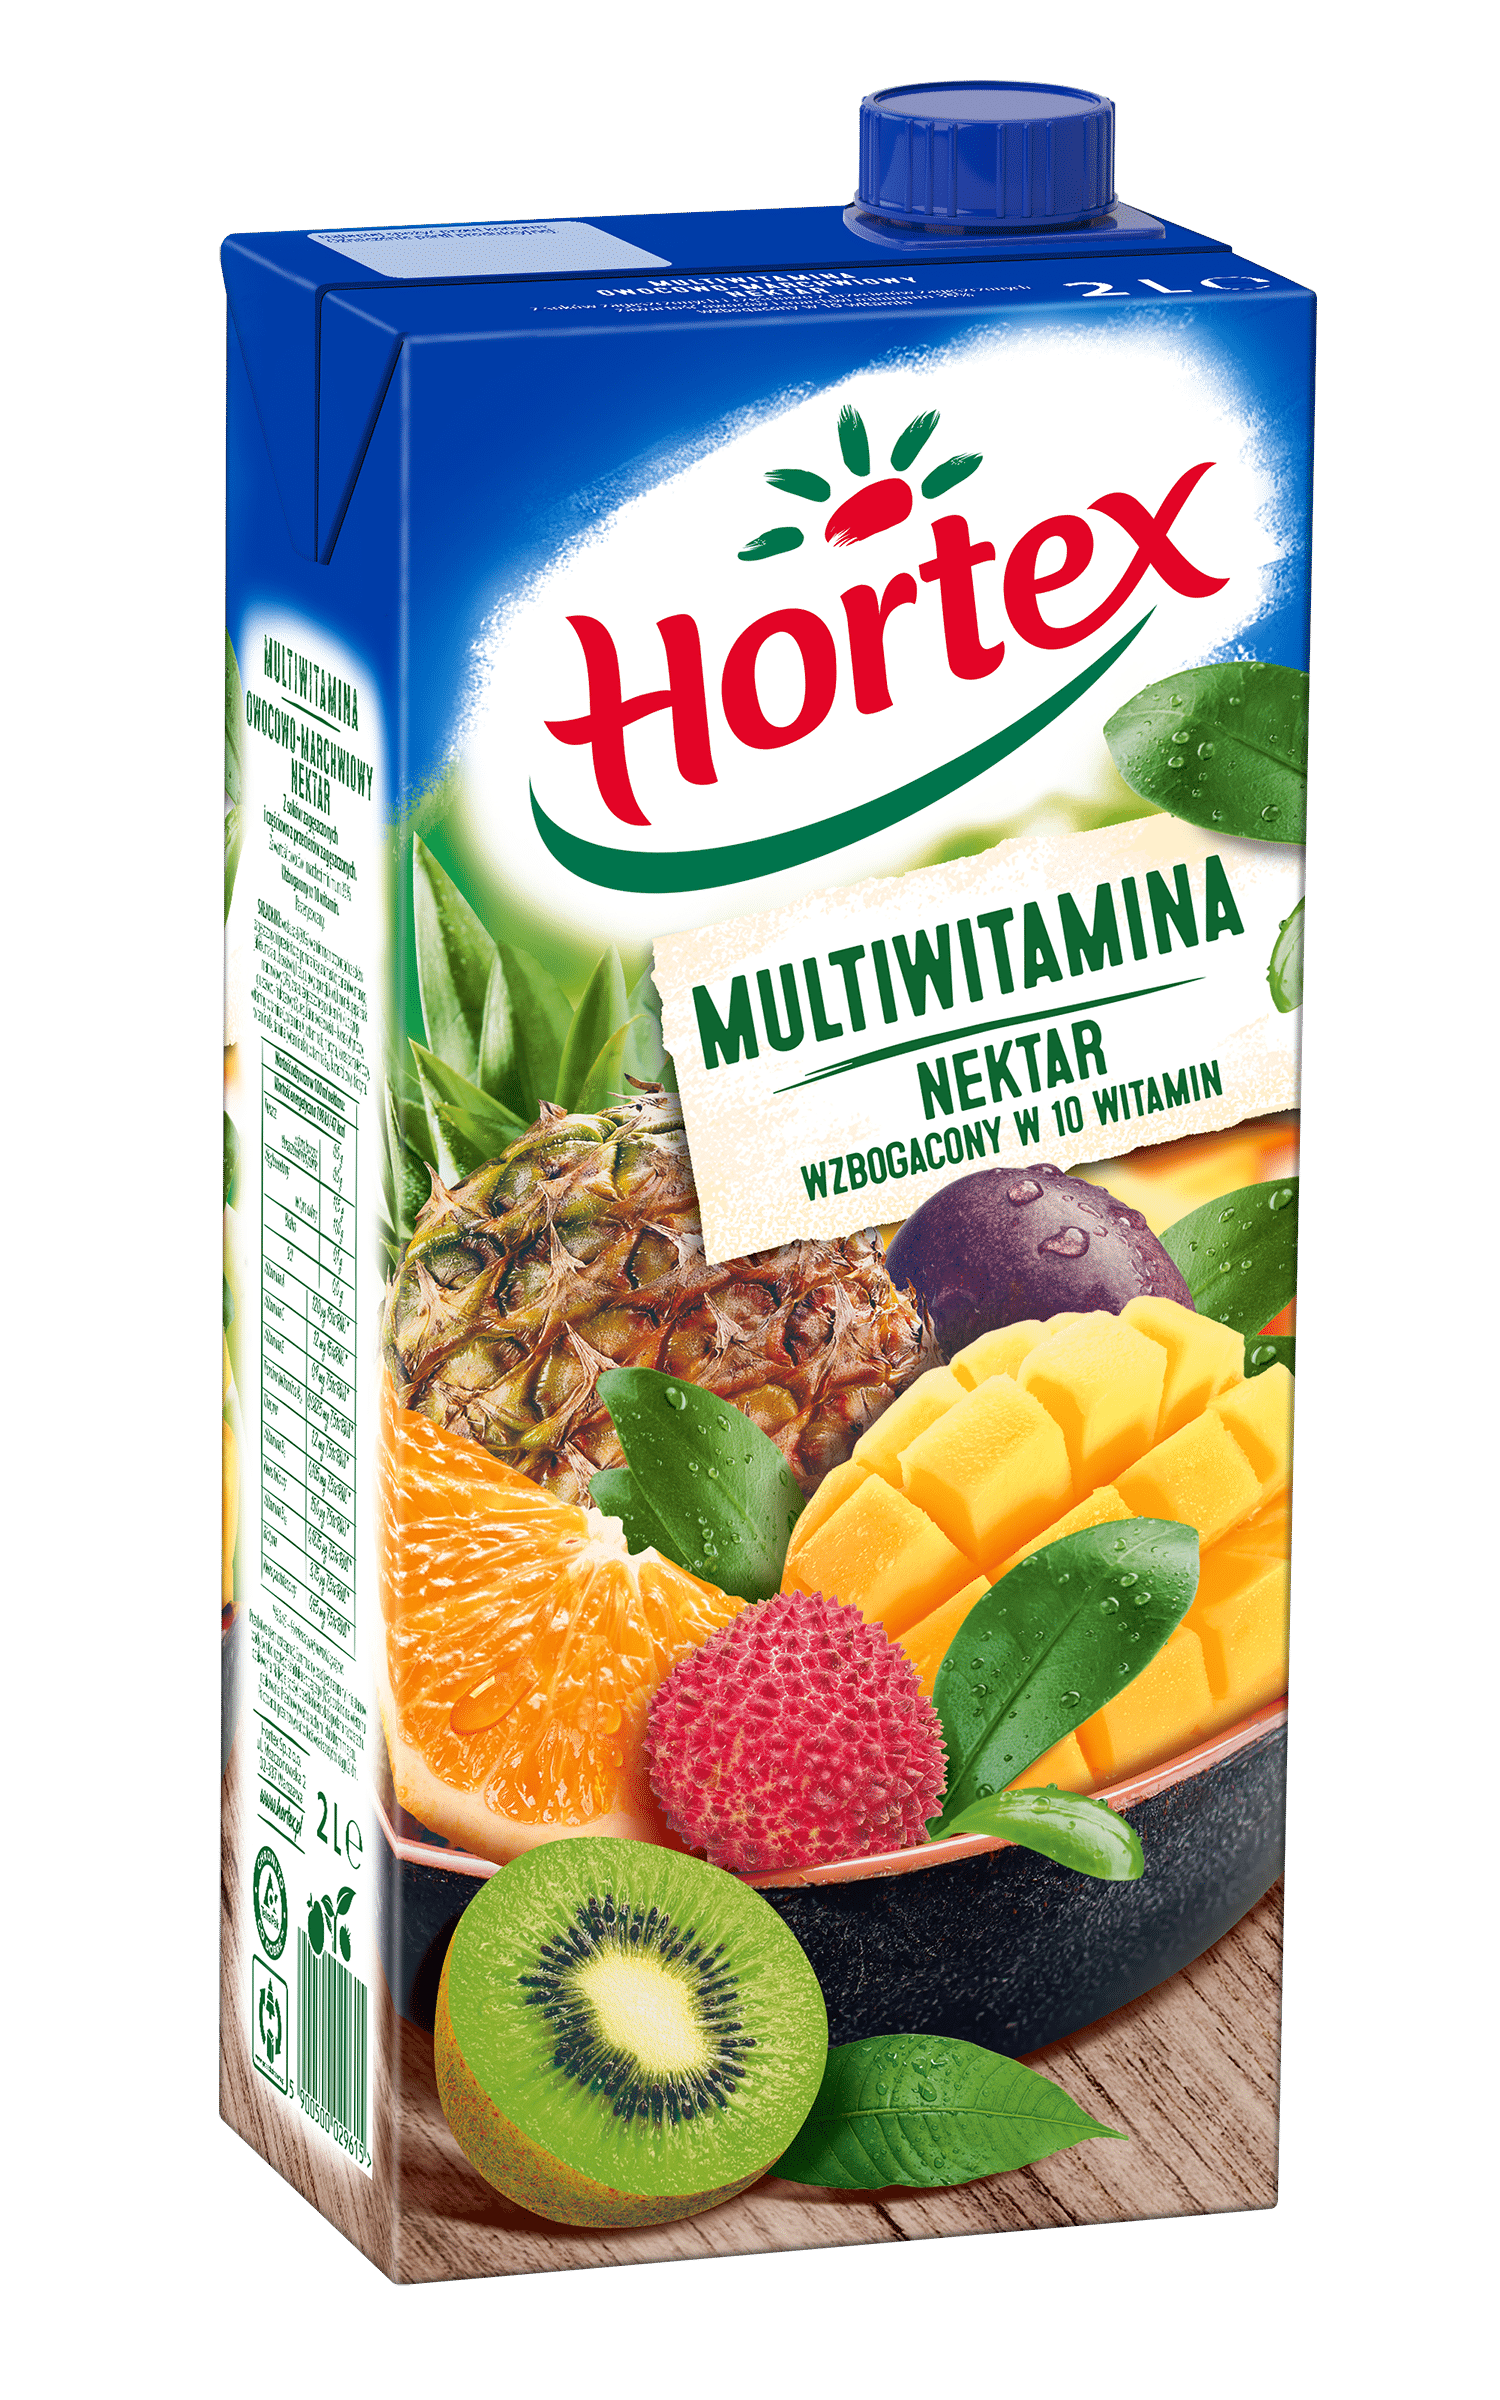 Multiwitamina nektar karton 2L 1